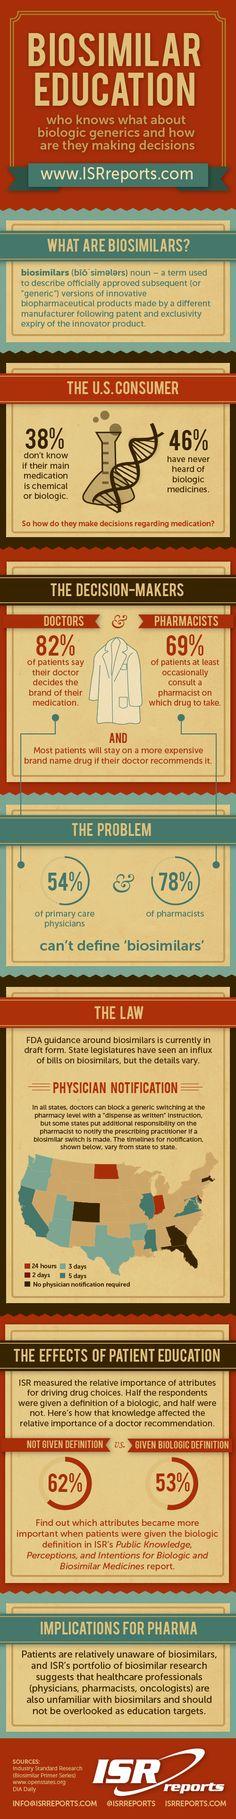 Biosimilar Education: who knows what about biologic generics and how are they making decisions #biosimilars #generics #pharmamktg #hcmktg